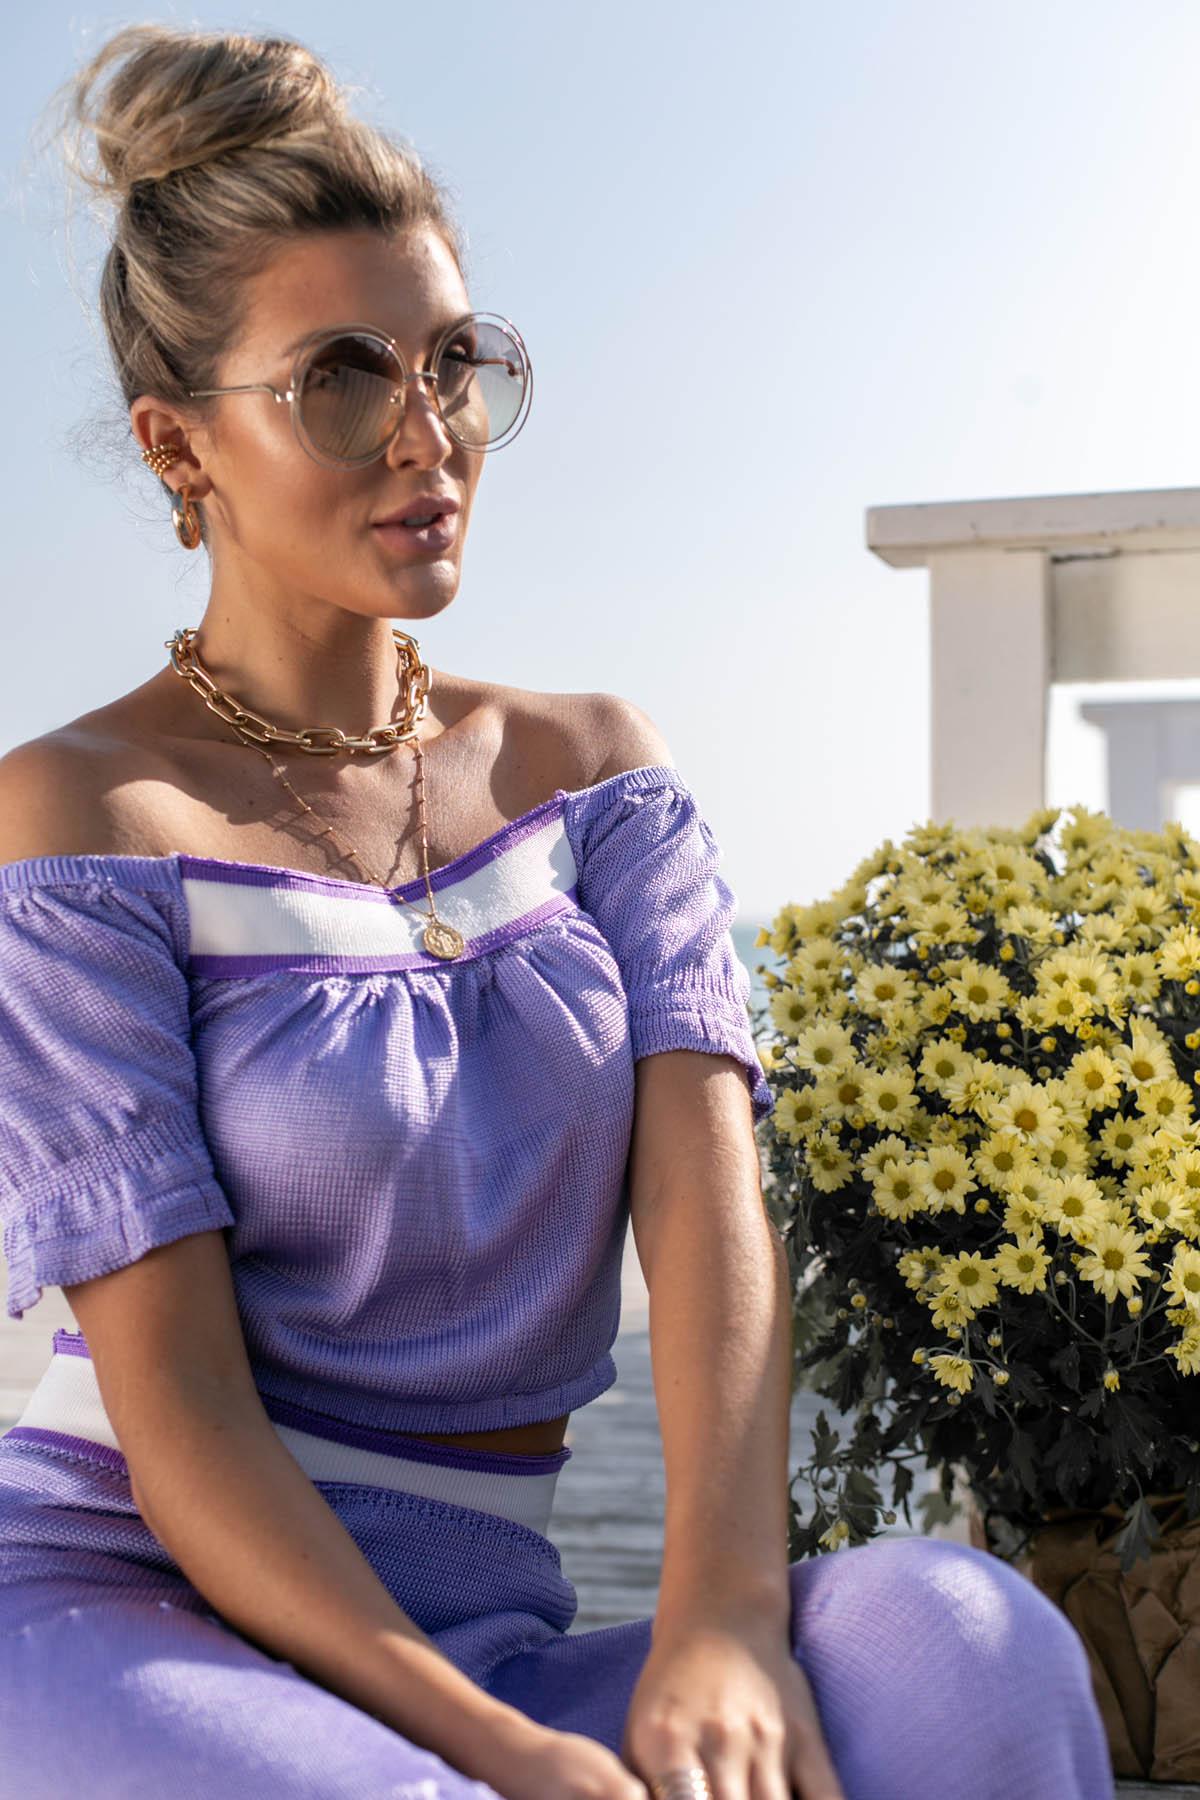 Blusa Cropped Hortência Vera Tricot Feminino Roxo / Lilas / Branco